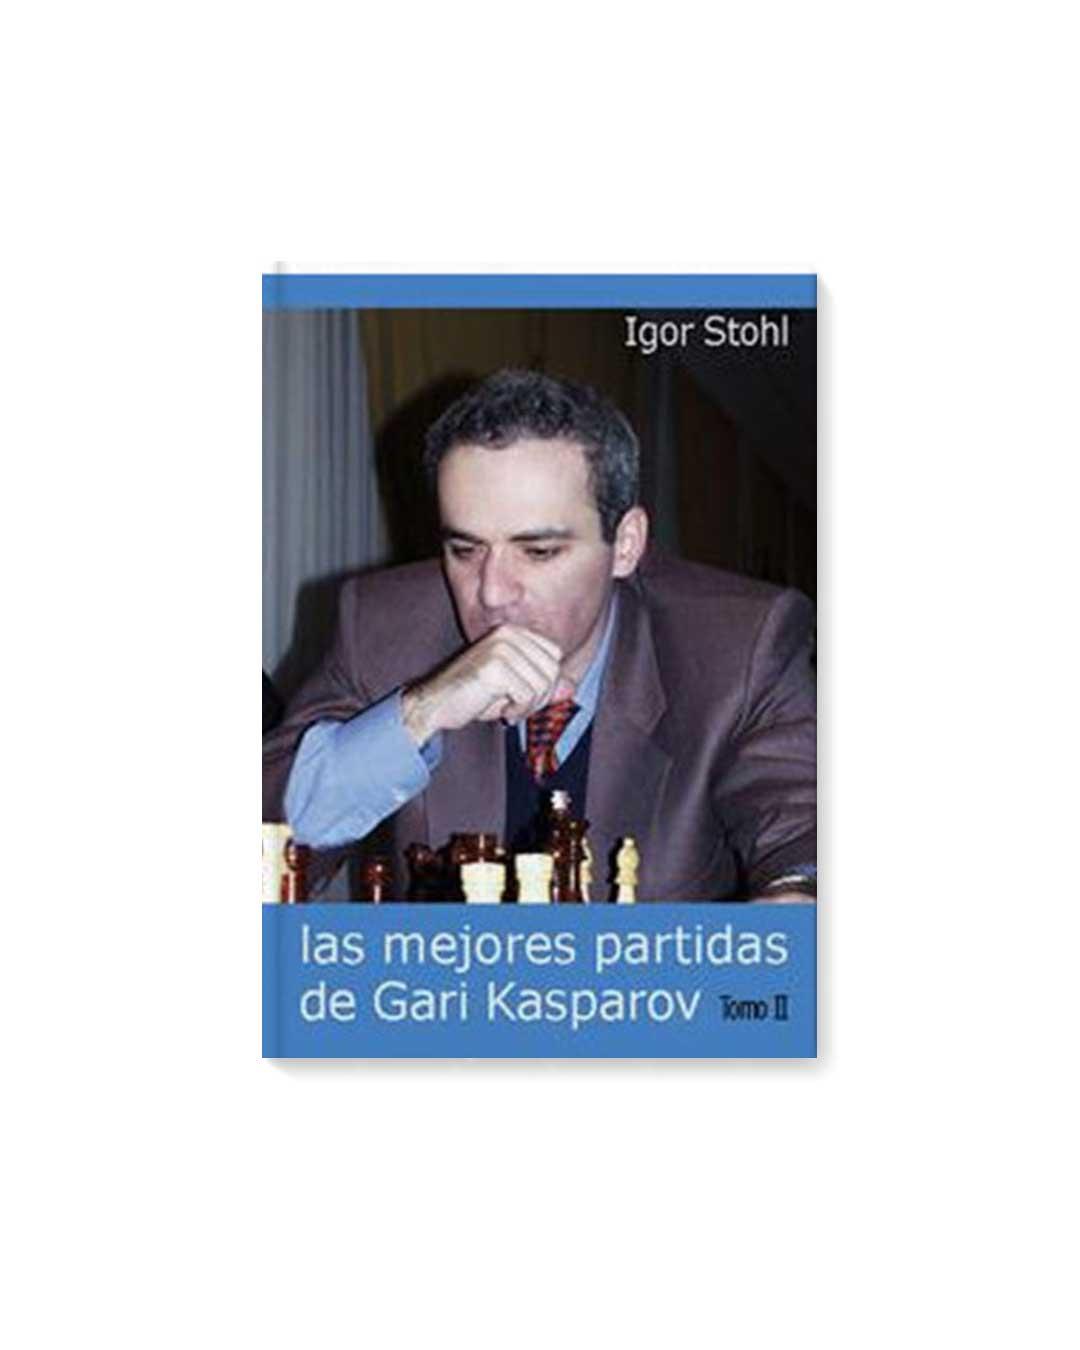 Las mejores partidas de Gary Kasparov tomo 2 - Stohl